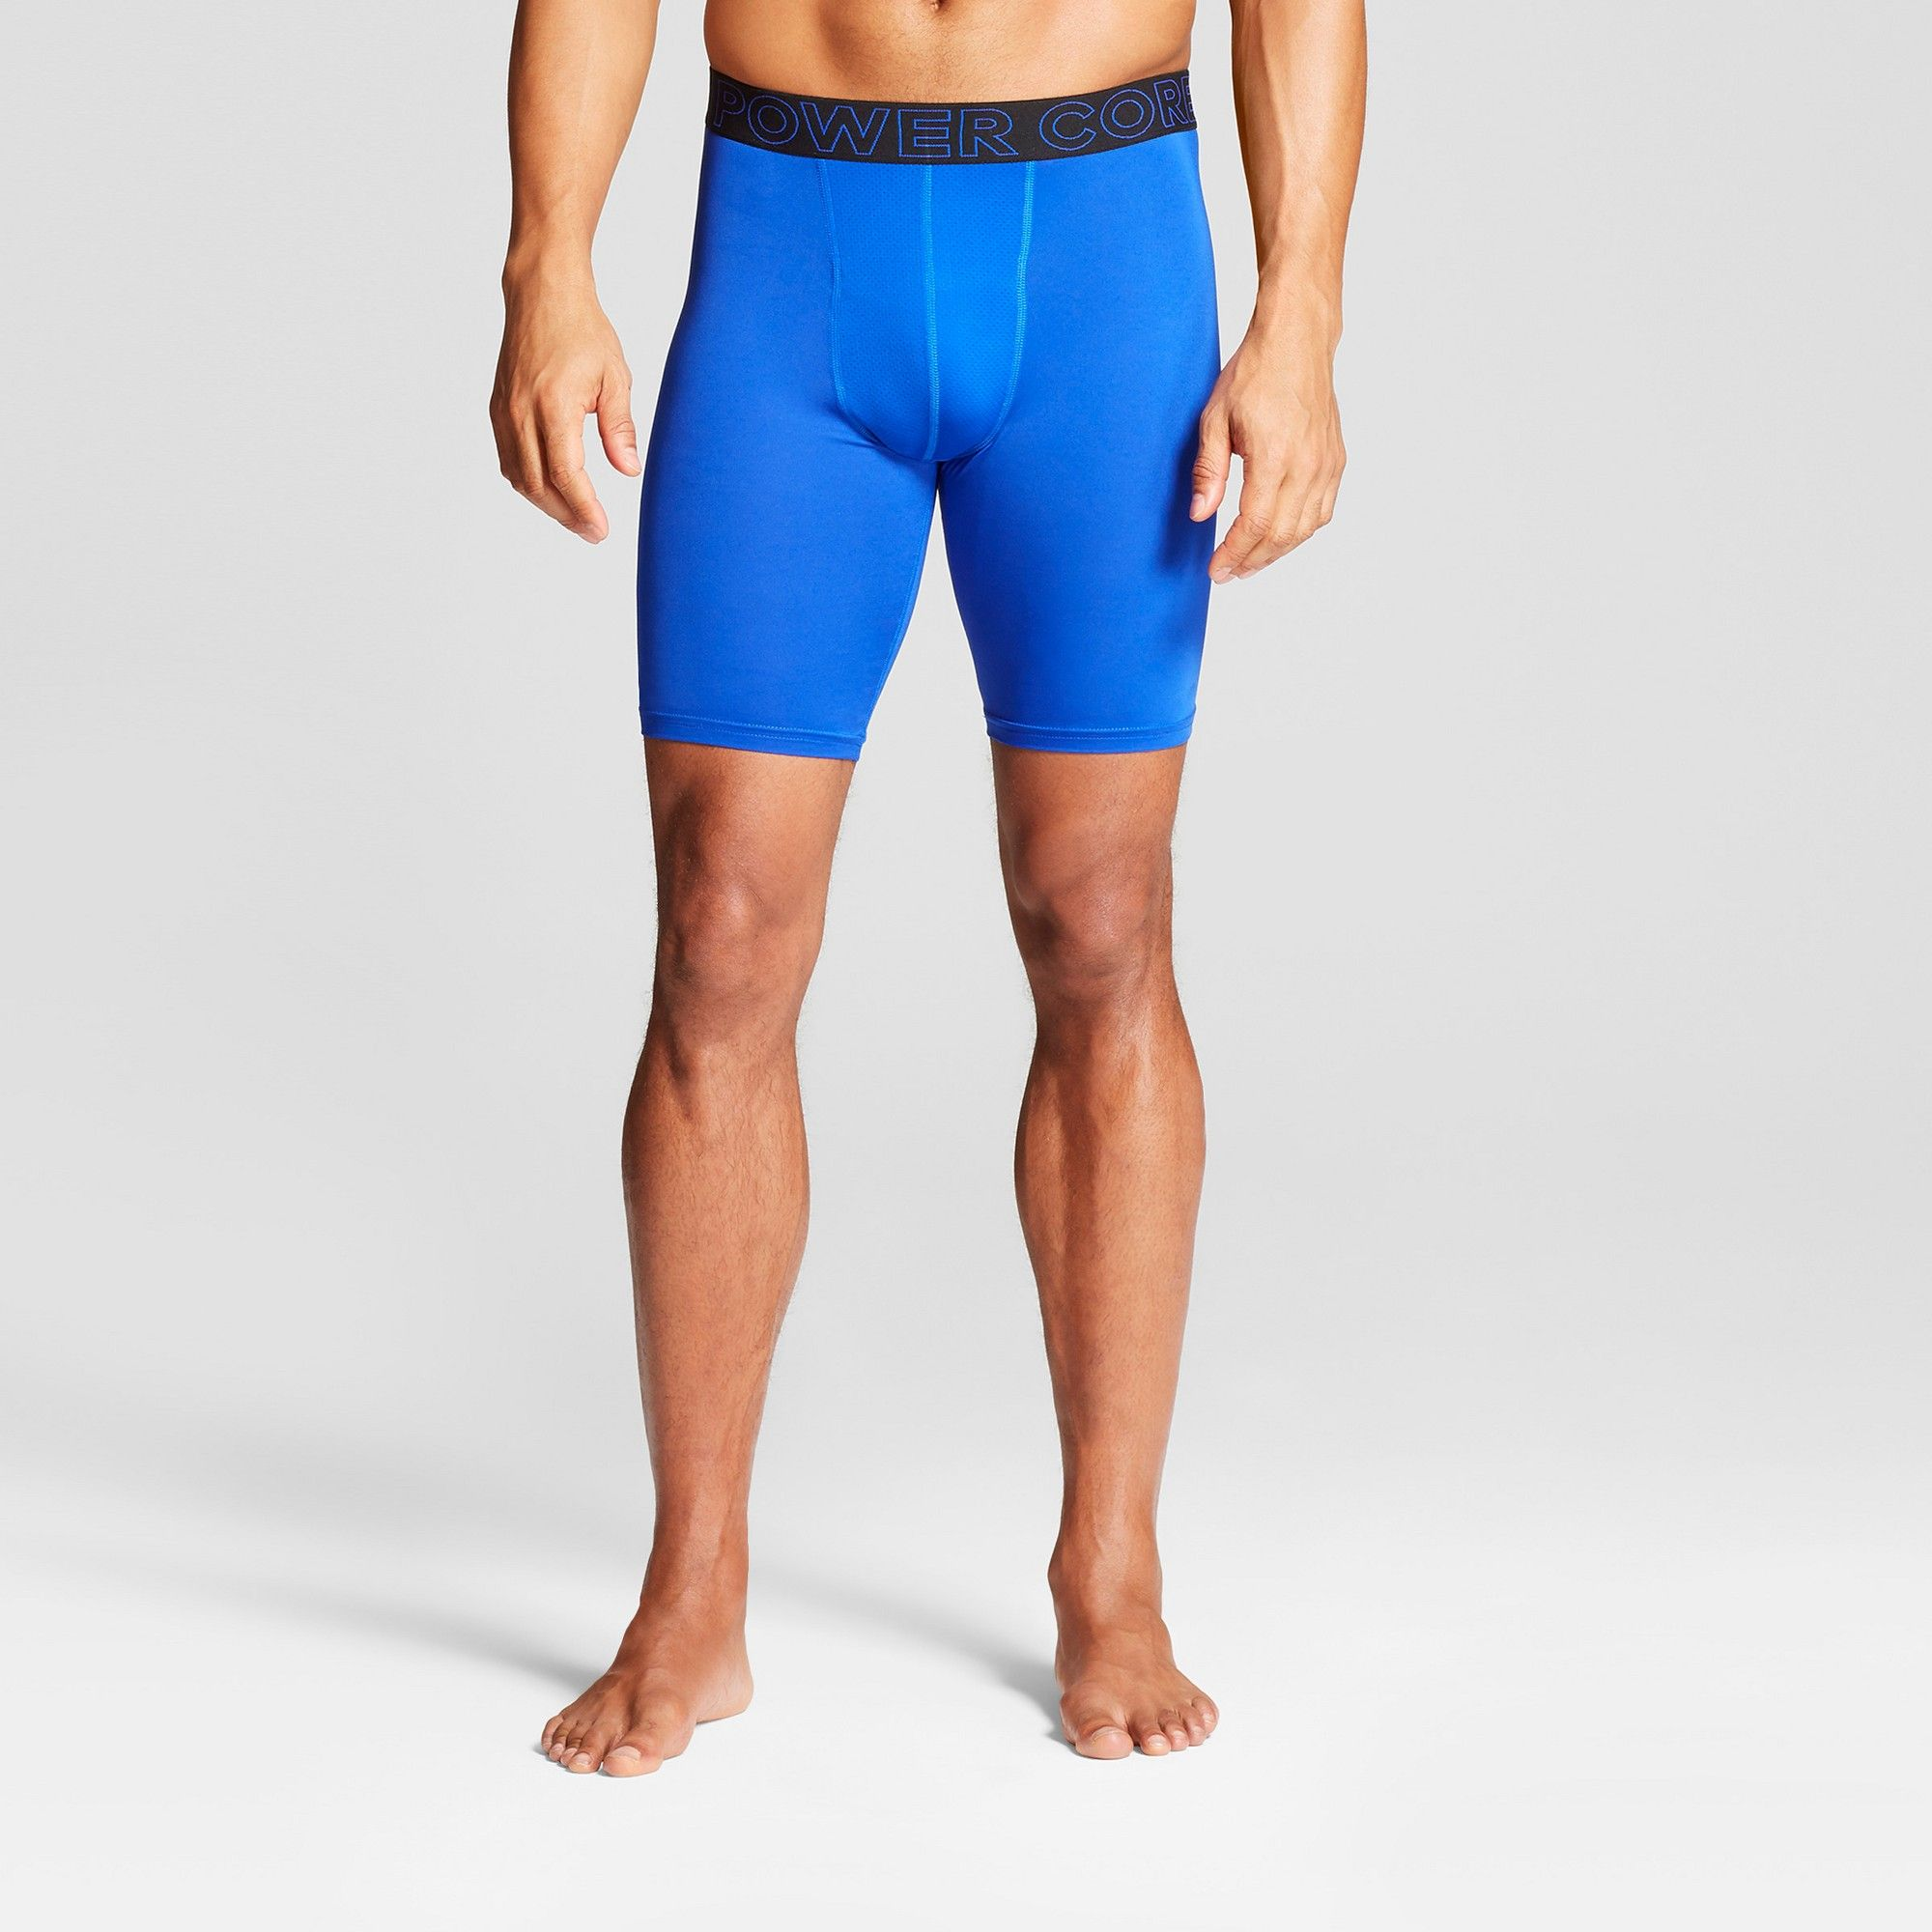 0379090824 Men's 9 Compression Shorts - C9 Champion Flight Blue Xxl   Products ...